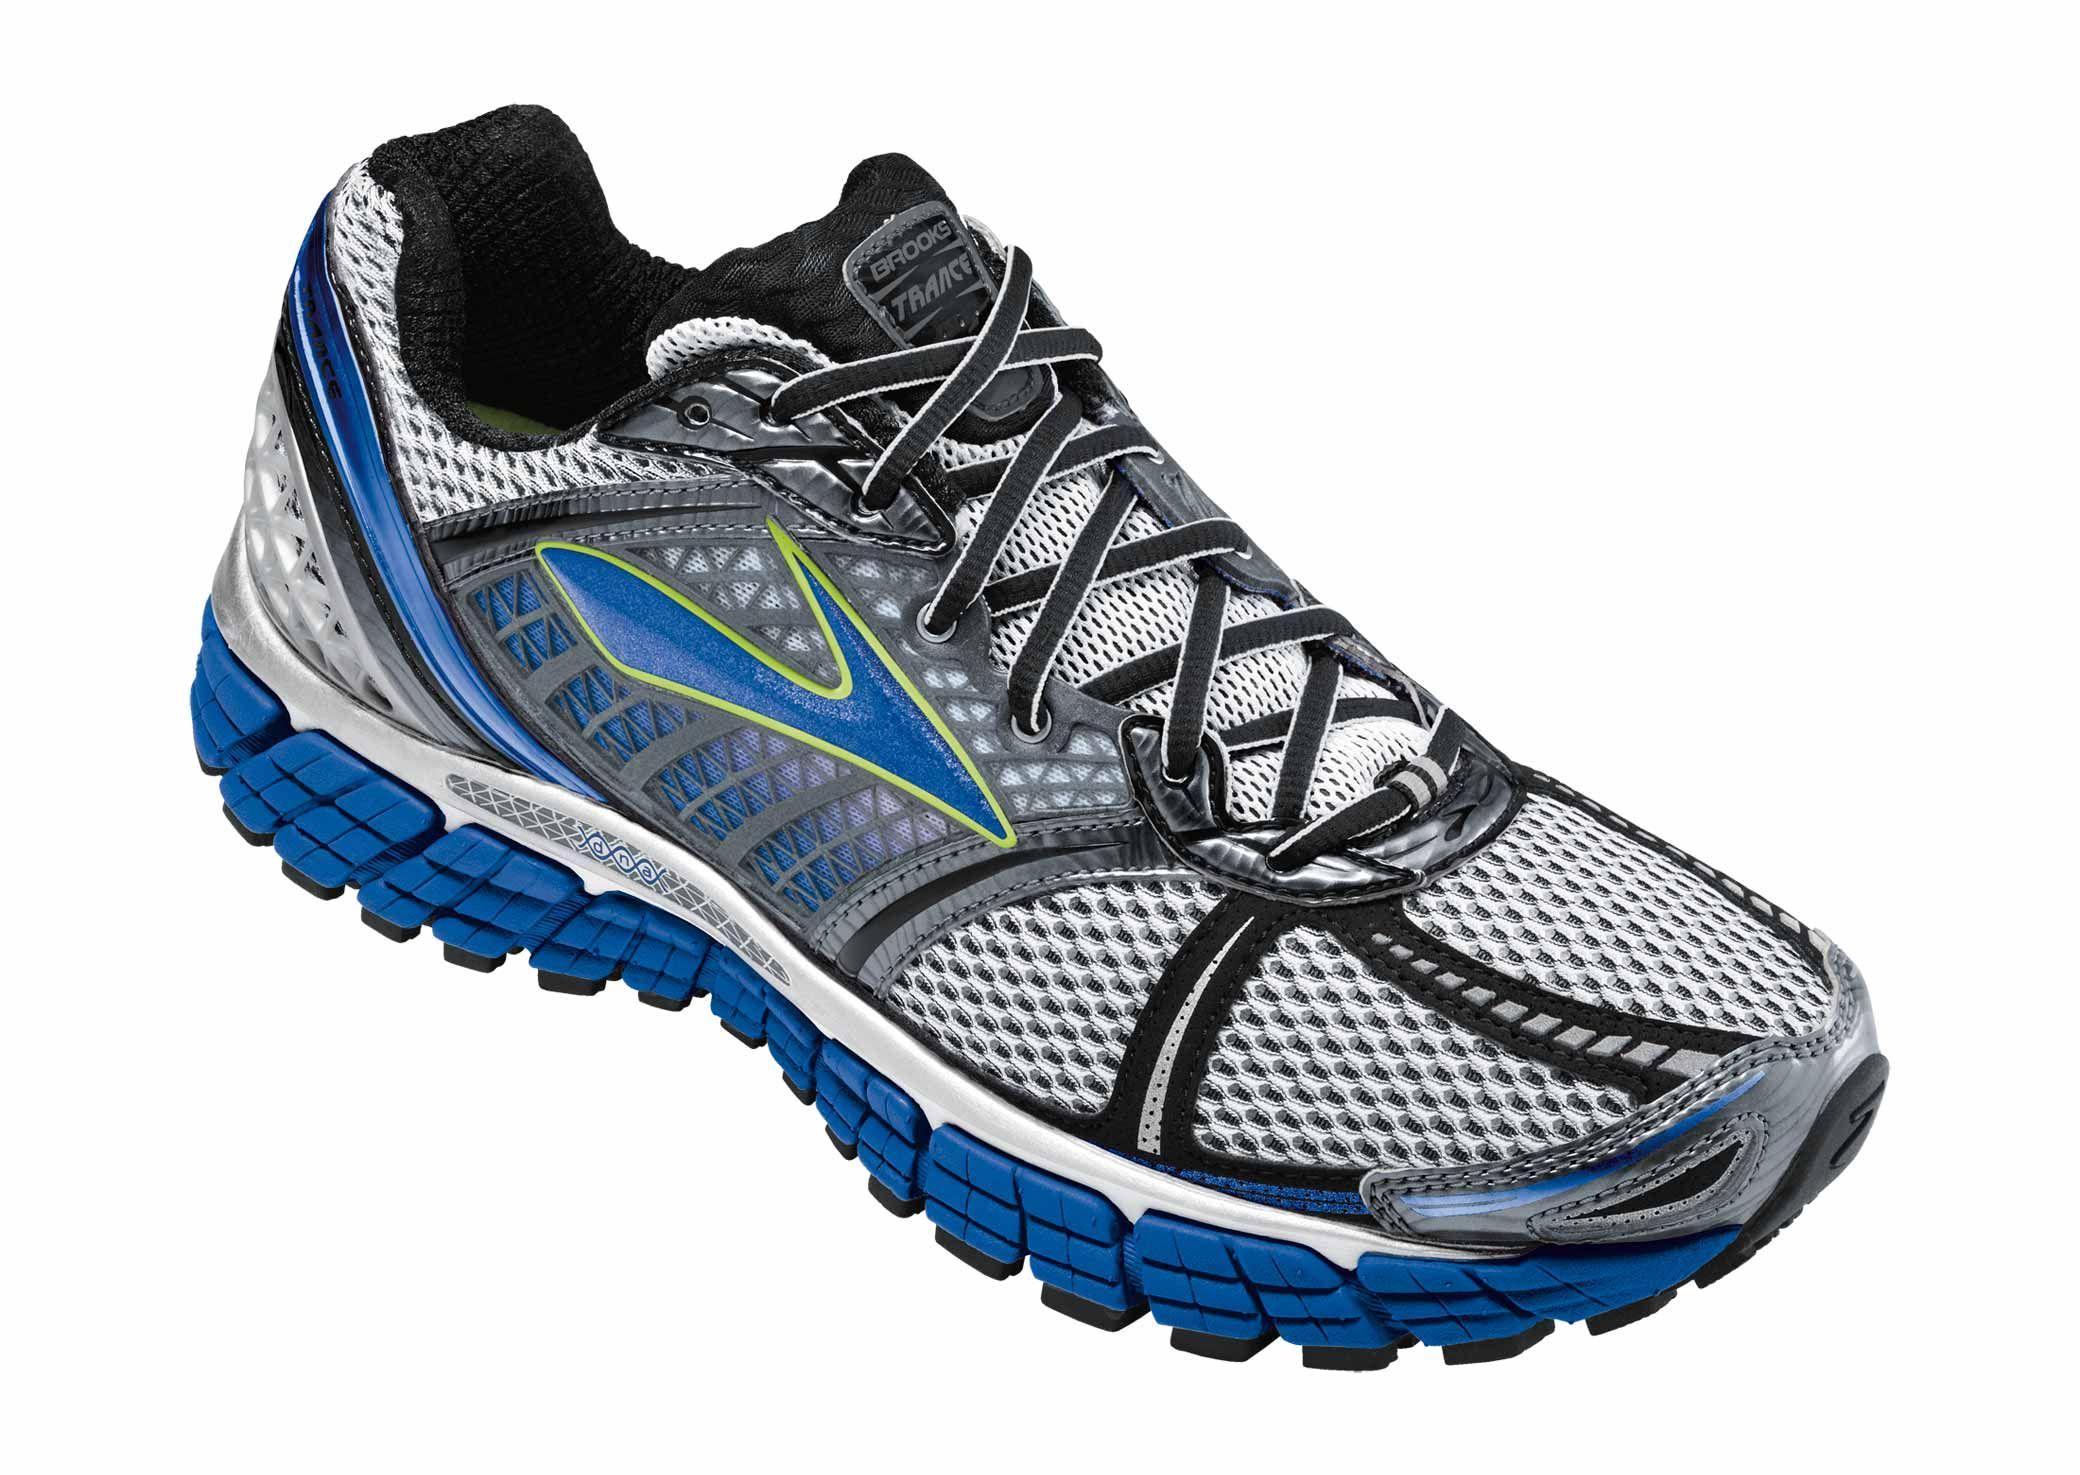 Brooks Trance 12 men's running shoe